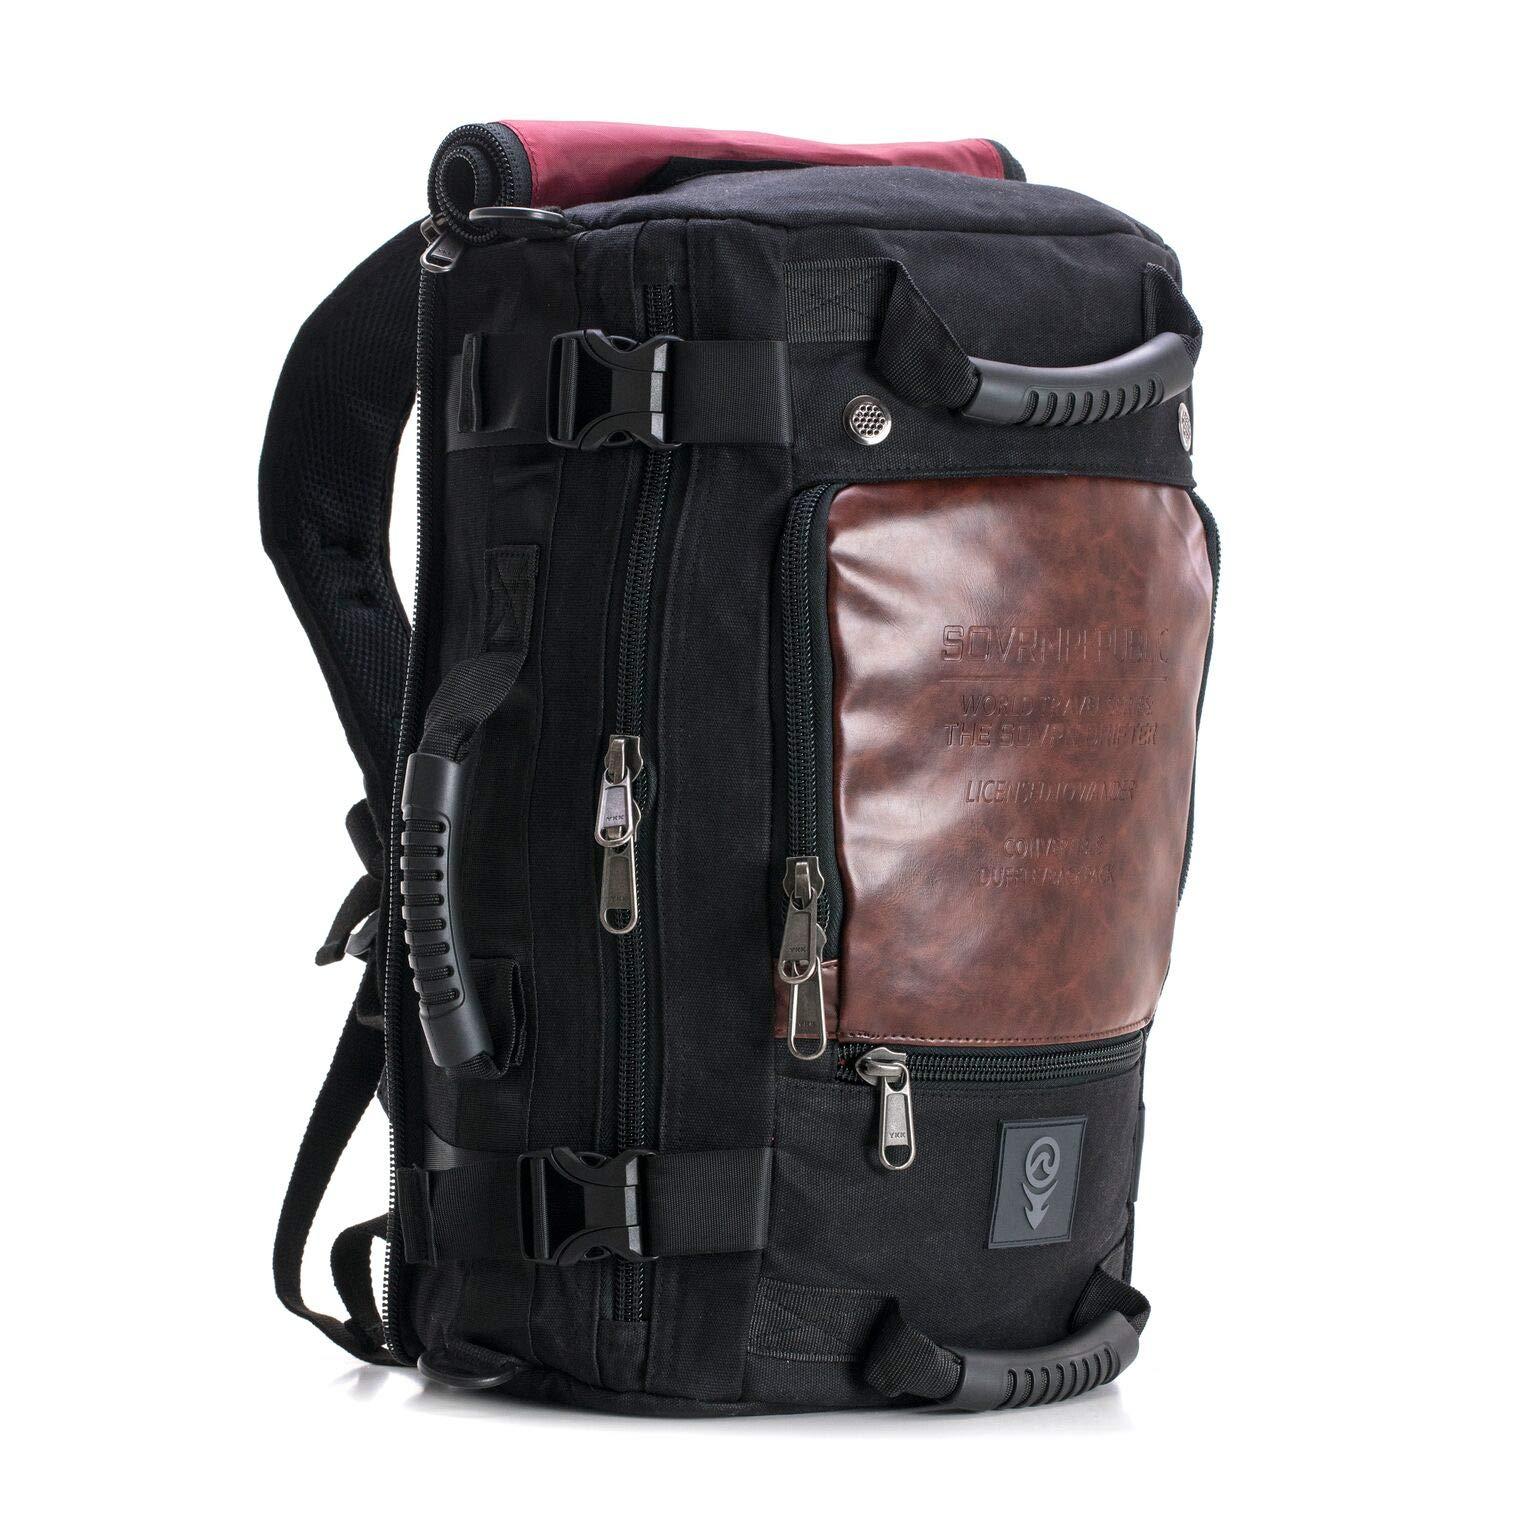 SOVRN Republic Canvas Material Duffel Bag Backpack 30L Sovrn Drifter, Black